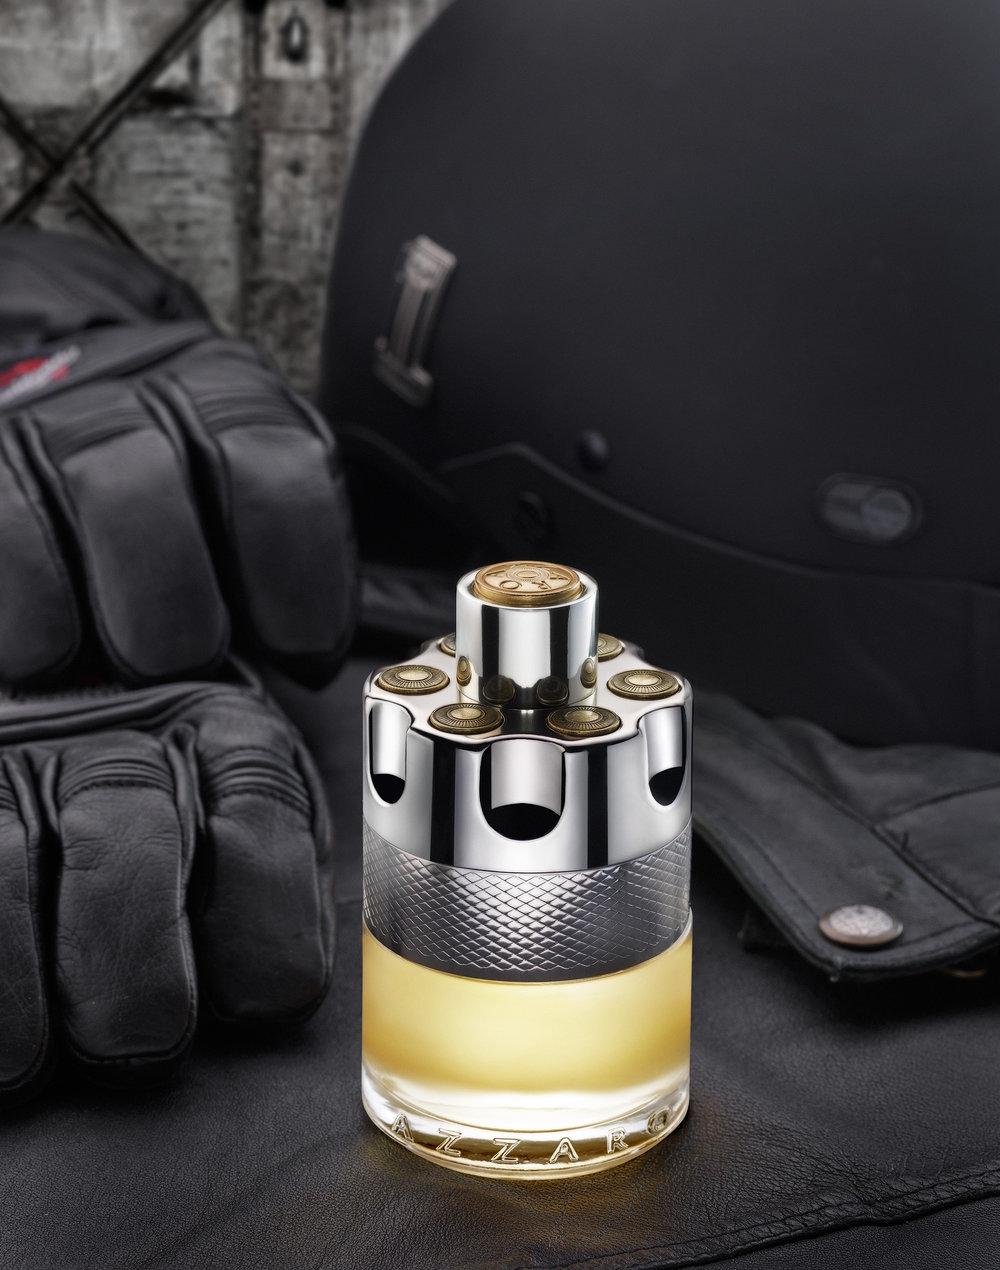 Wanted-perfume-v3orton-copy.jpg